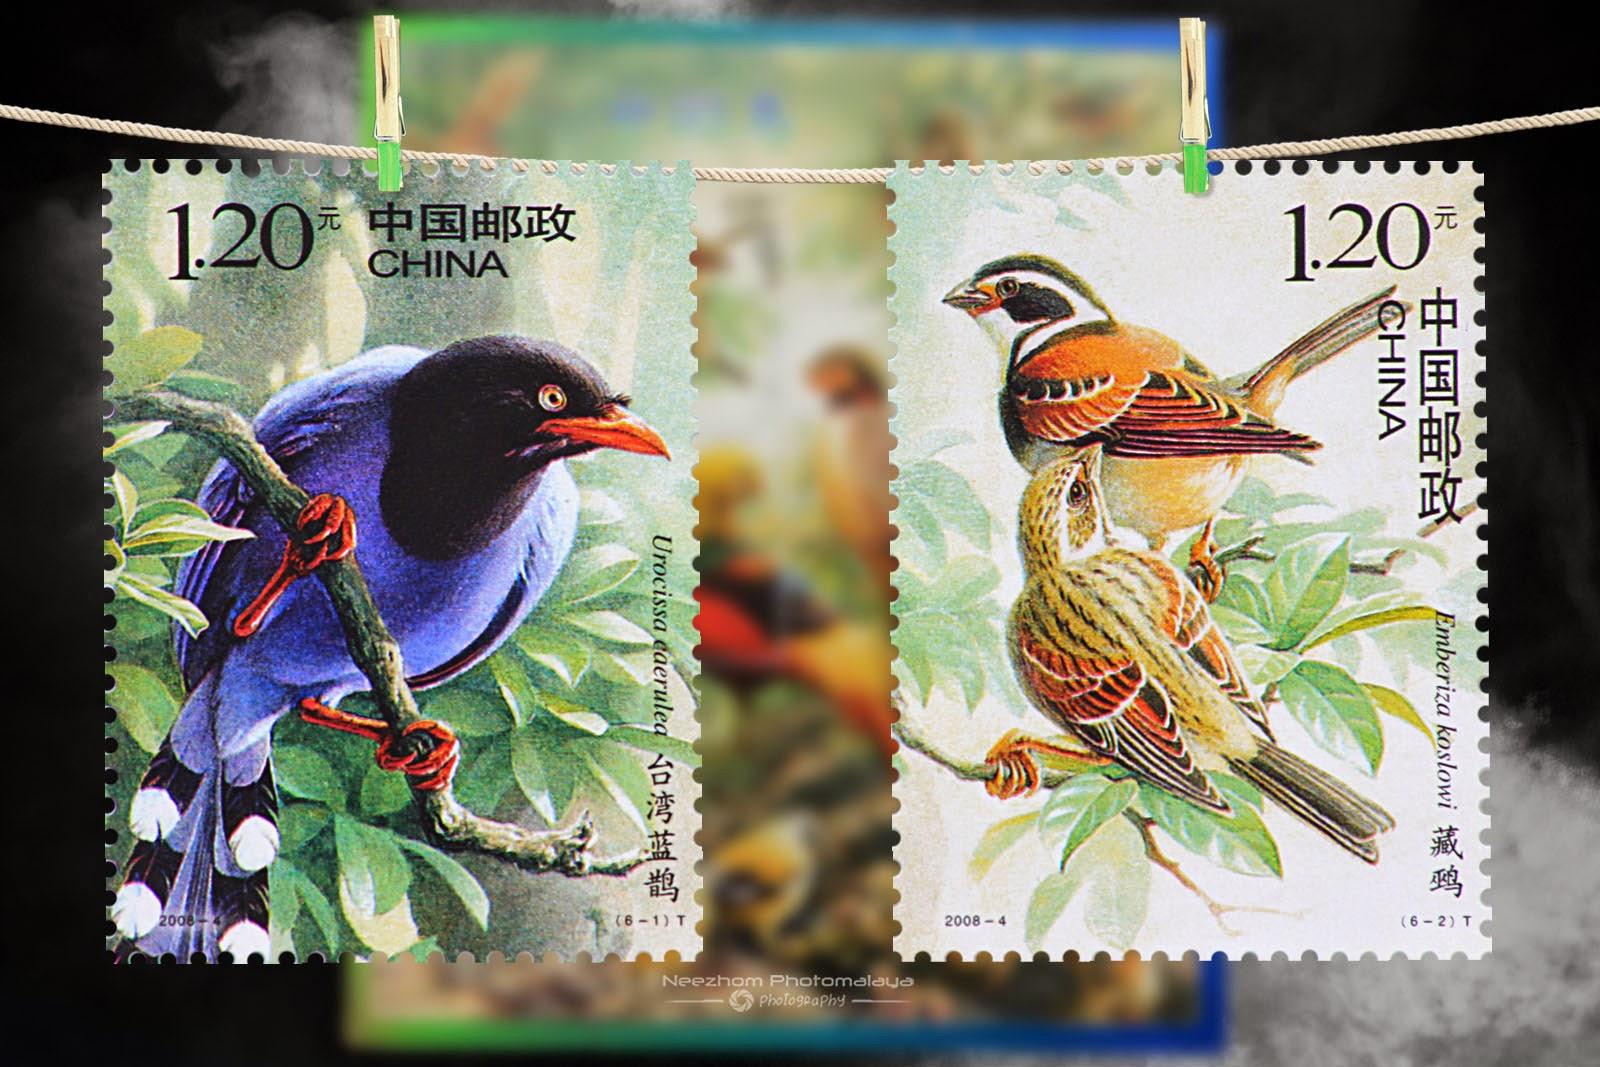 2008 Birds of China stamps - Urocissa caerulea, Emberiza koslowi 120 Fen